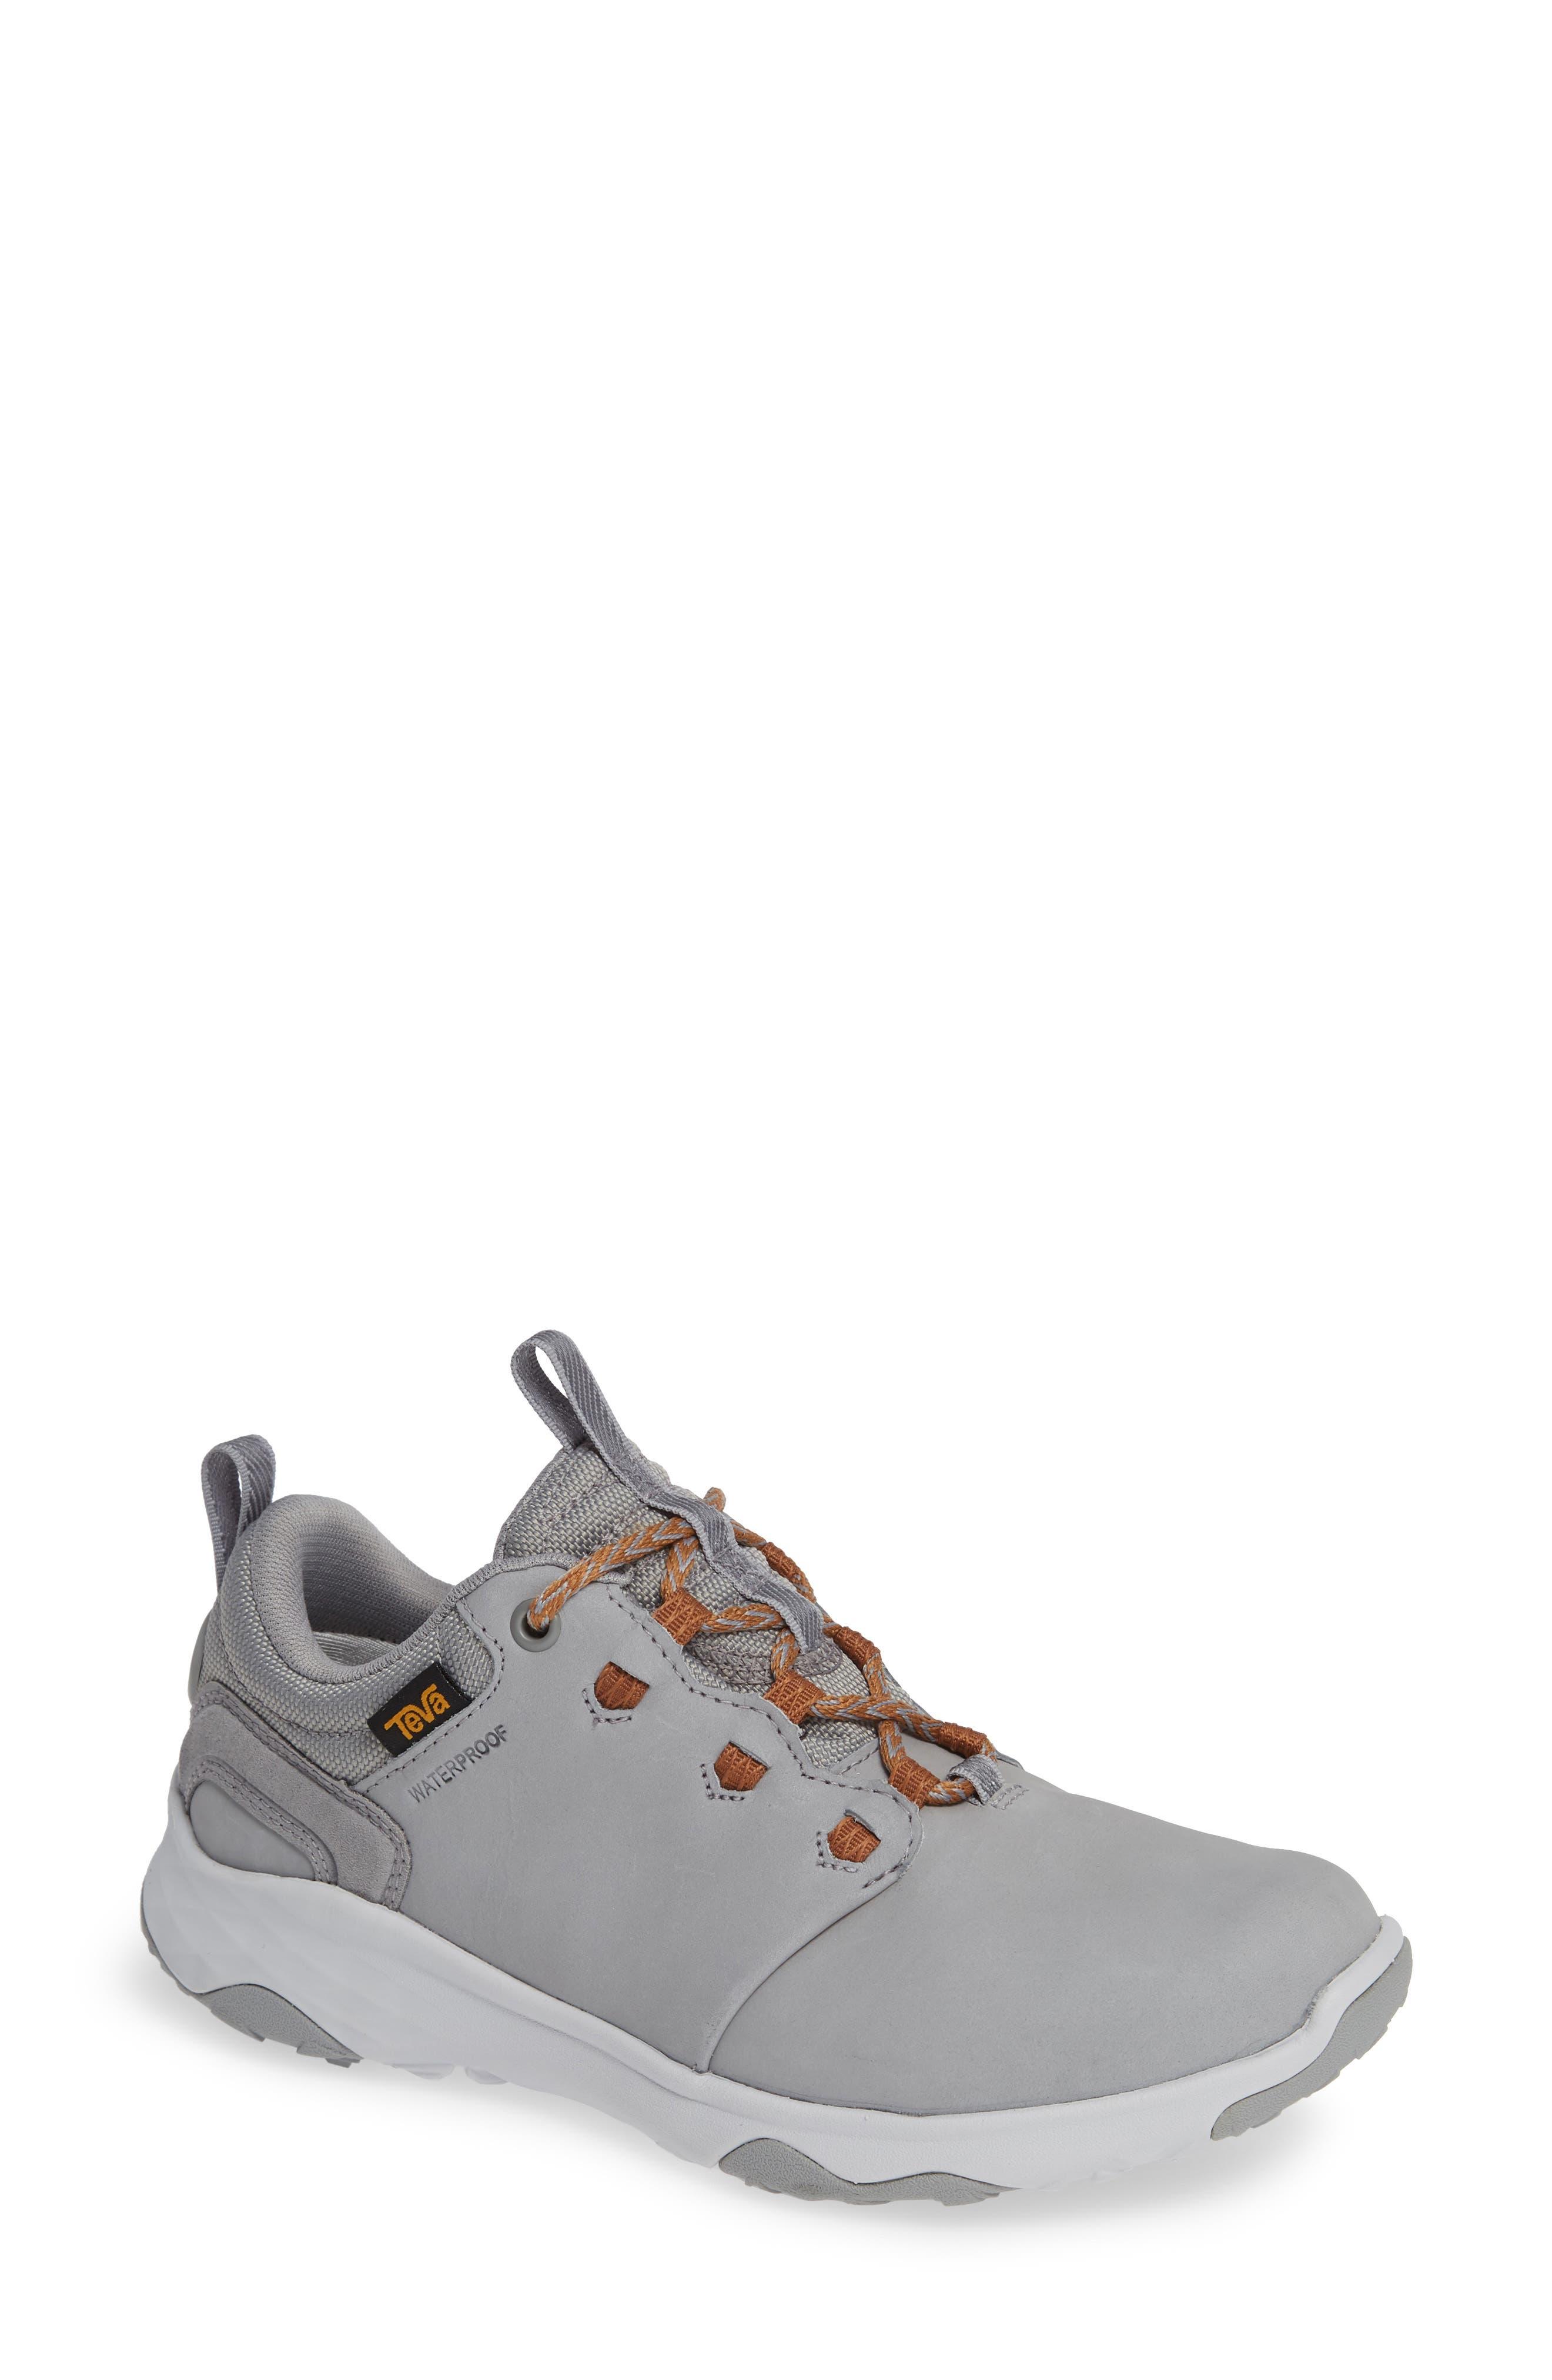 'Arrowood' Waterproof Sneaker,                             Main thumbnail 1, color,                             WILD DOVE LEATHER